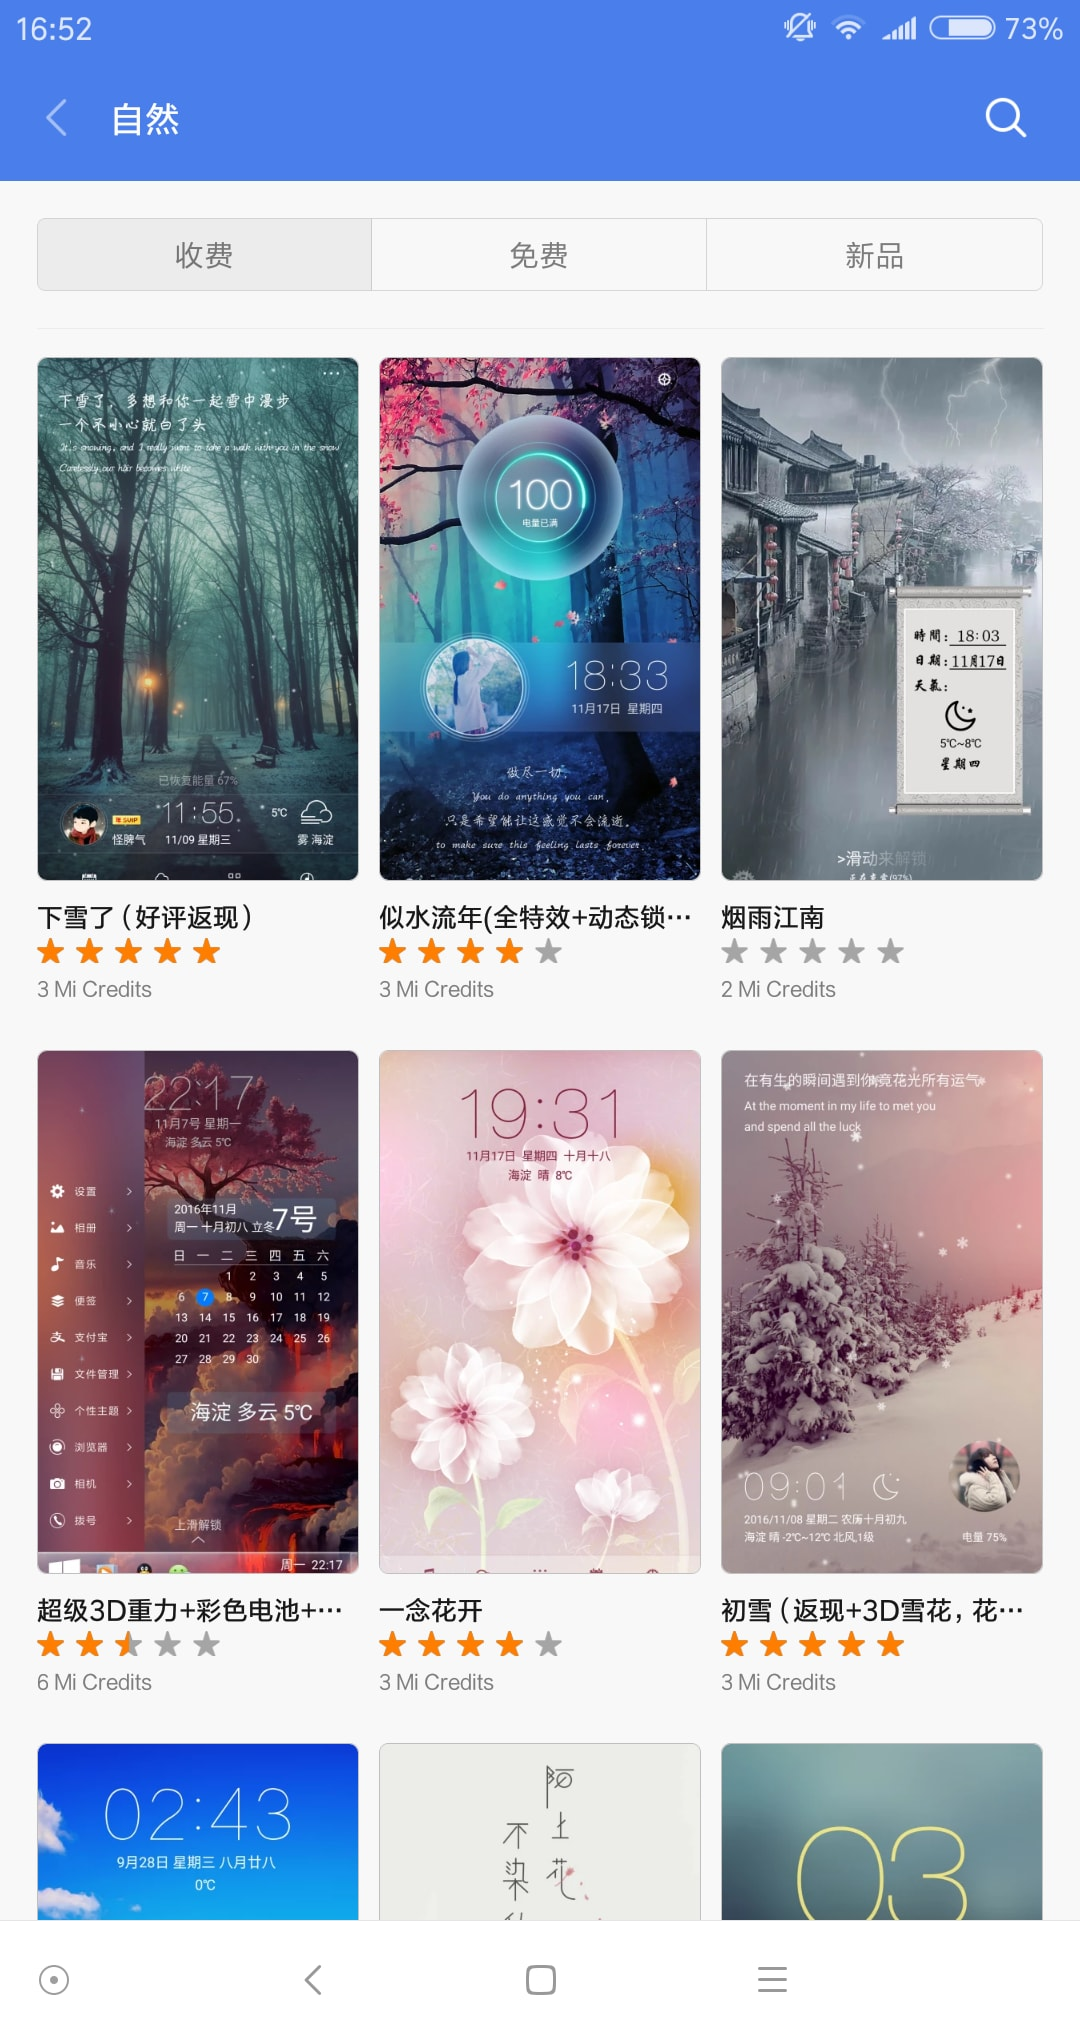 screenshot-xiaomi-mi-mix-15